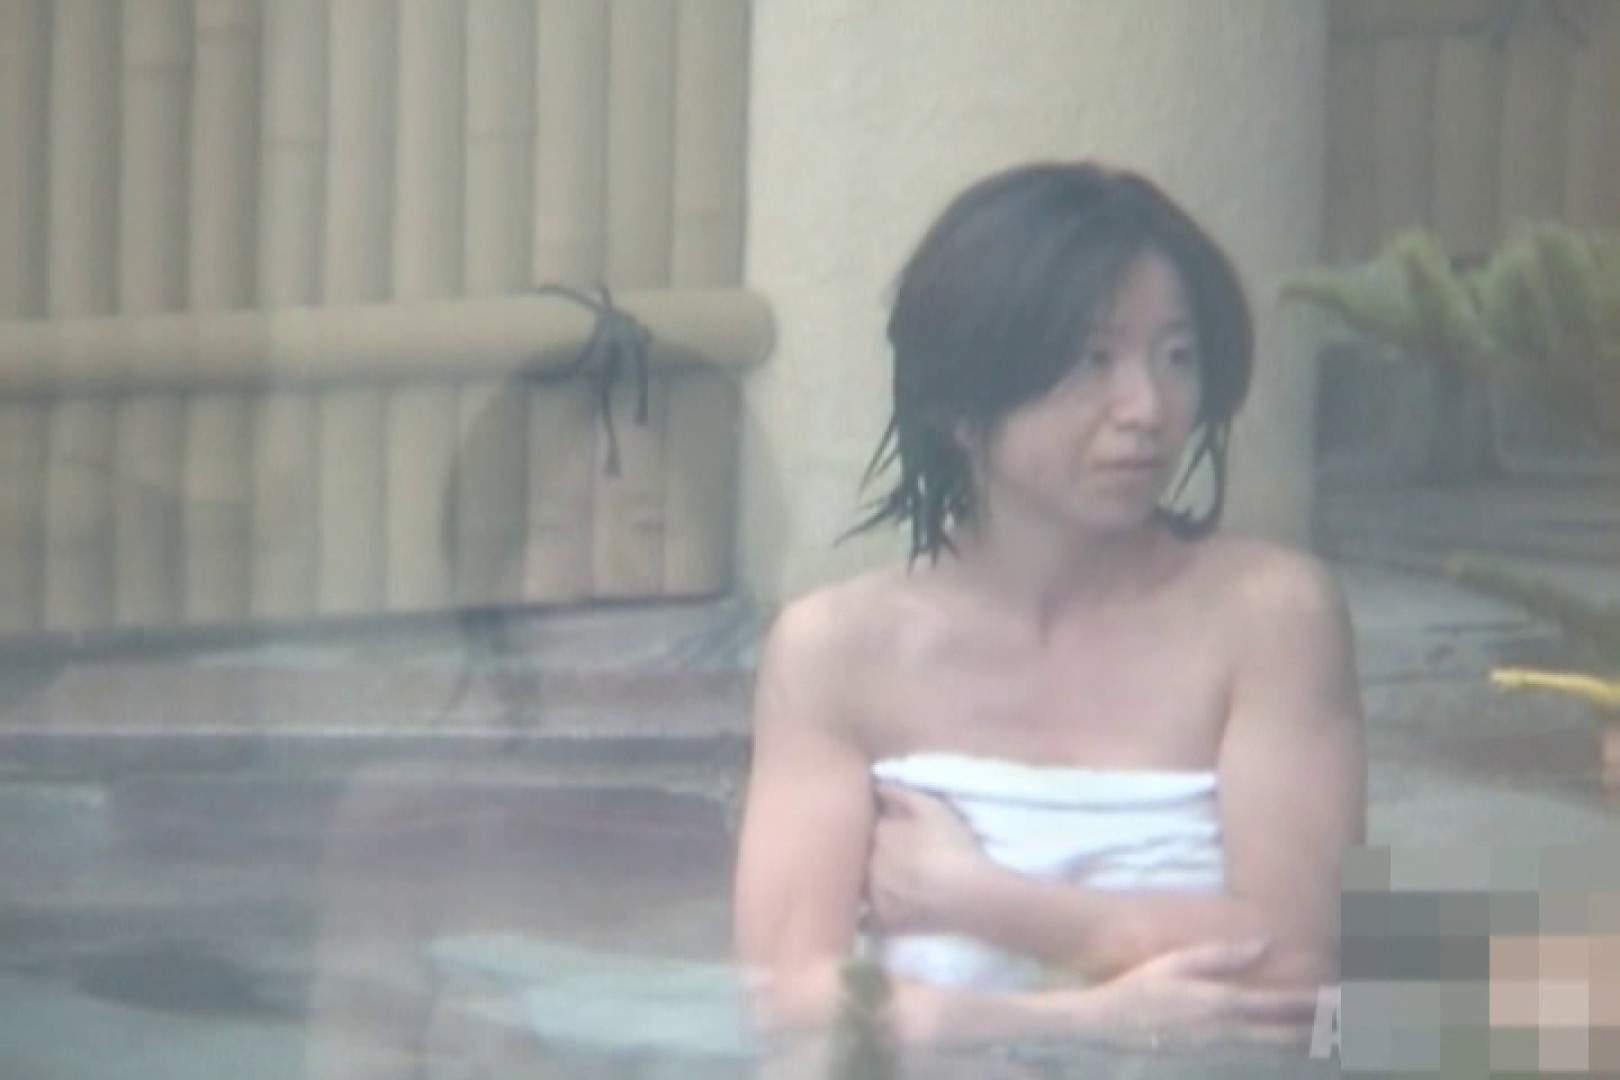 Aquaな露天風呂Vol.841 盗撮師作品 ワレメ動画紹介 77pic 77